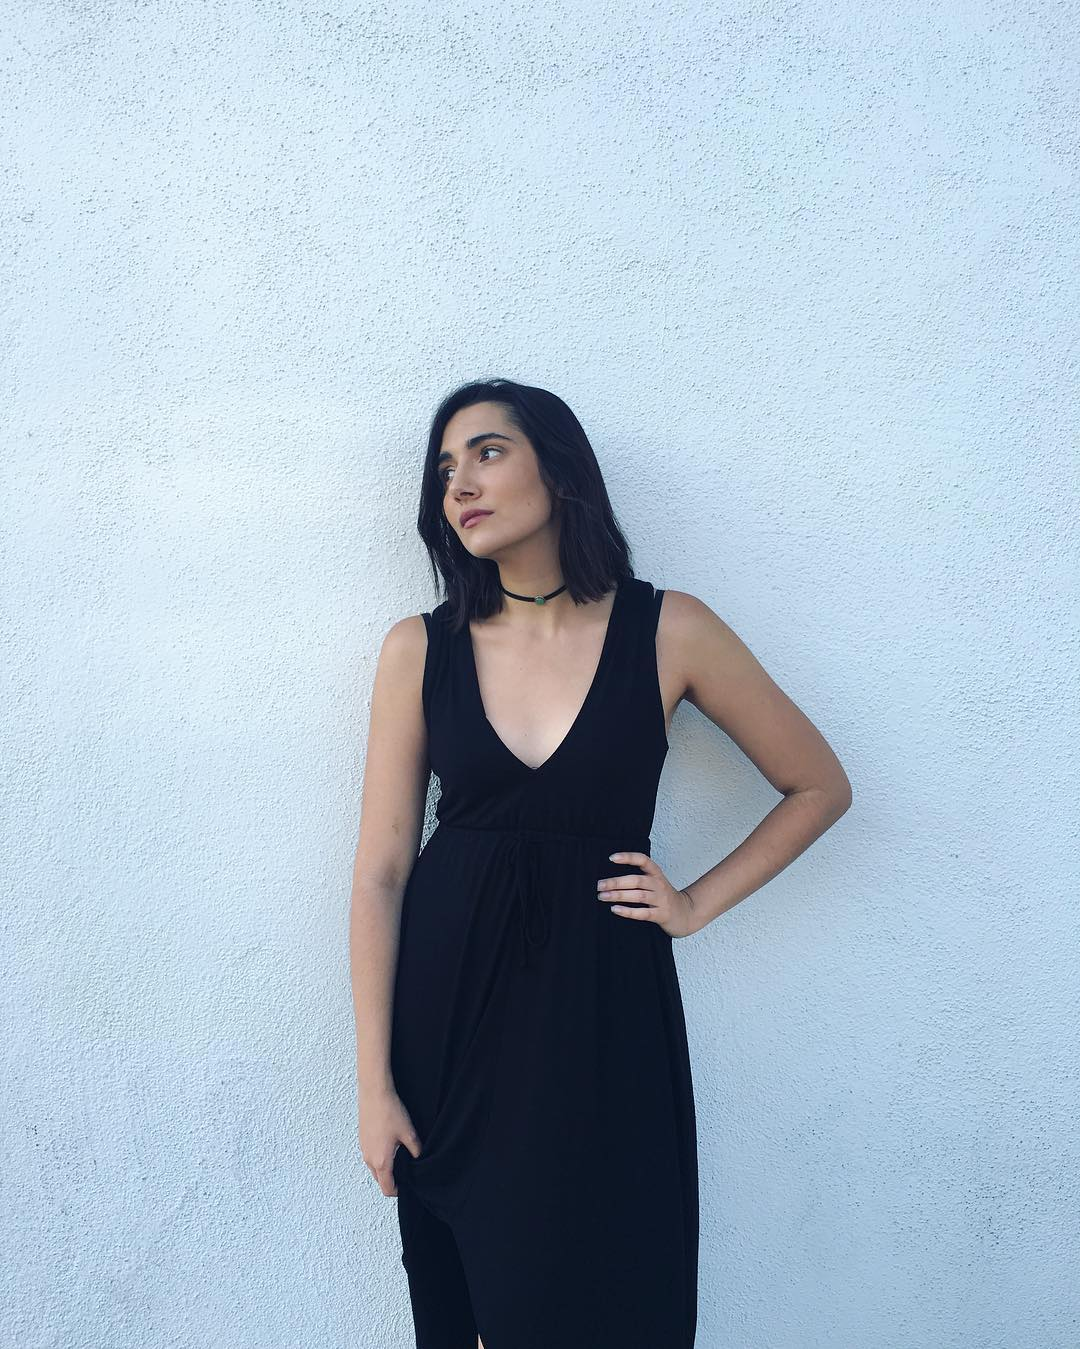 Safiya Nygaard sexy picture